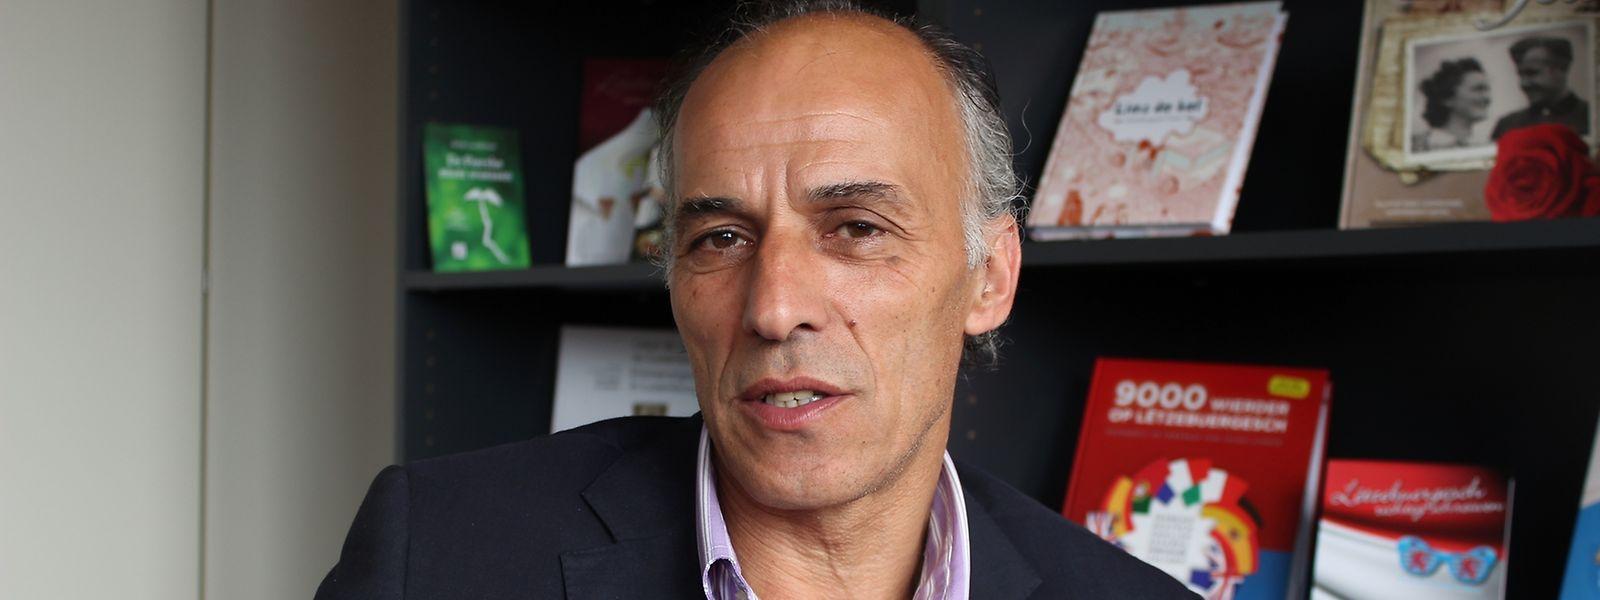 Luís Fonseca quer estádio cheio no Hamm Benfica - Tondela